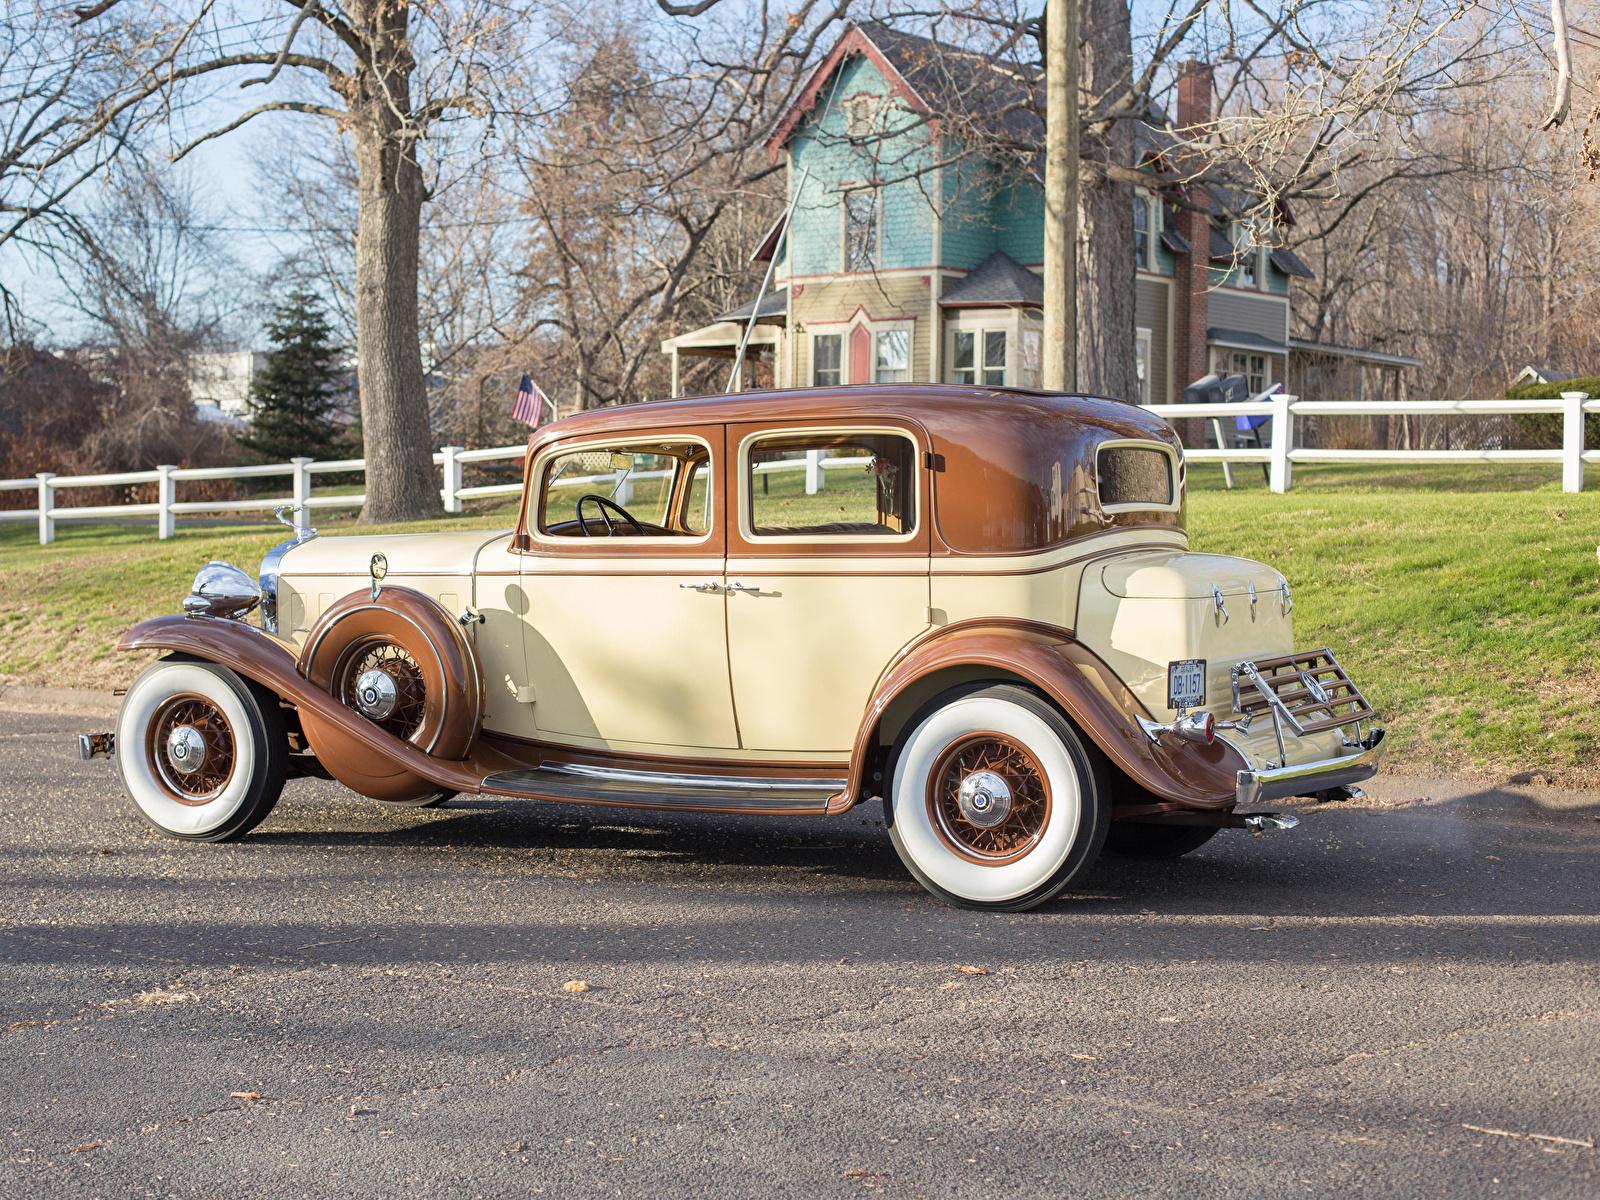 Картинка Cadillac 1932 V12 370-B Town Sedan by Fisher Сбоку Автомобили 1600x1200 Кадиллак авто машины машина автомобиль